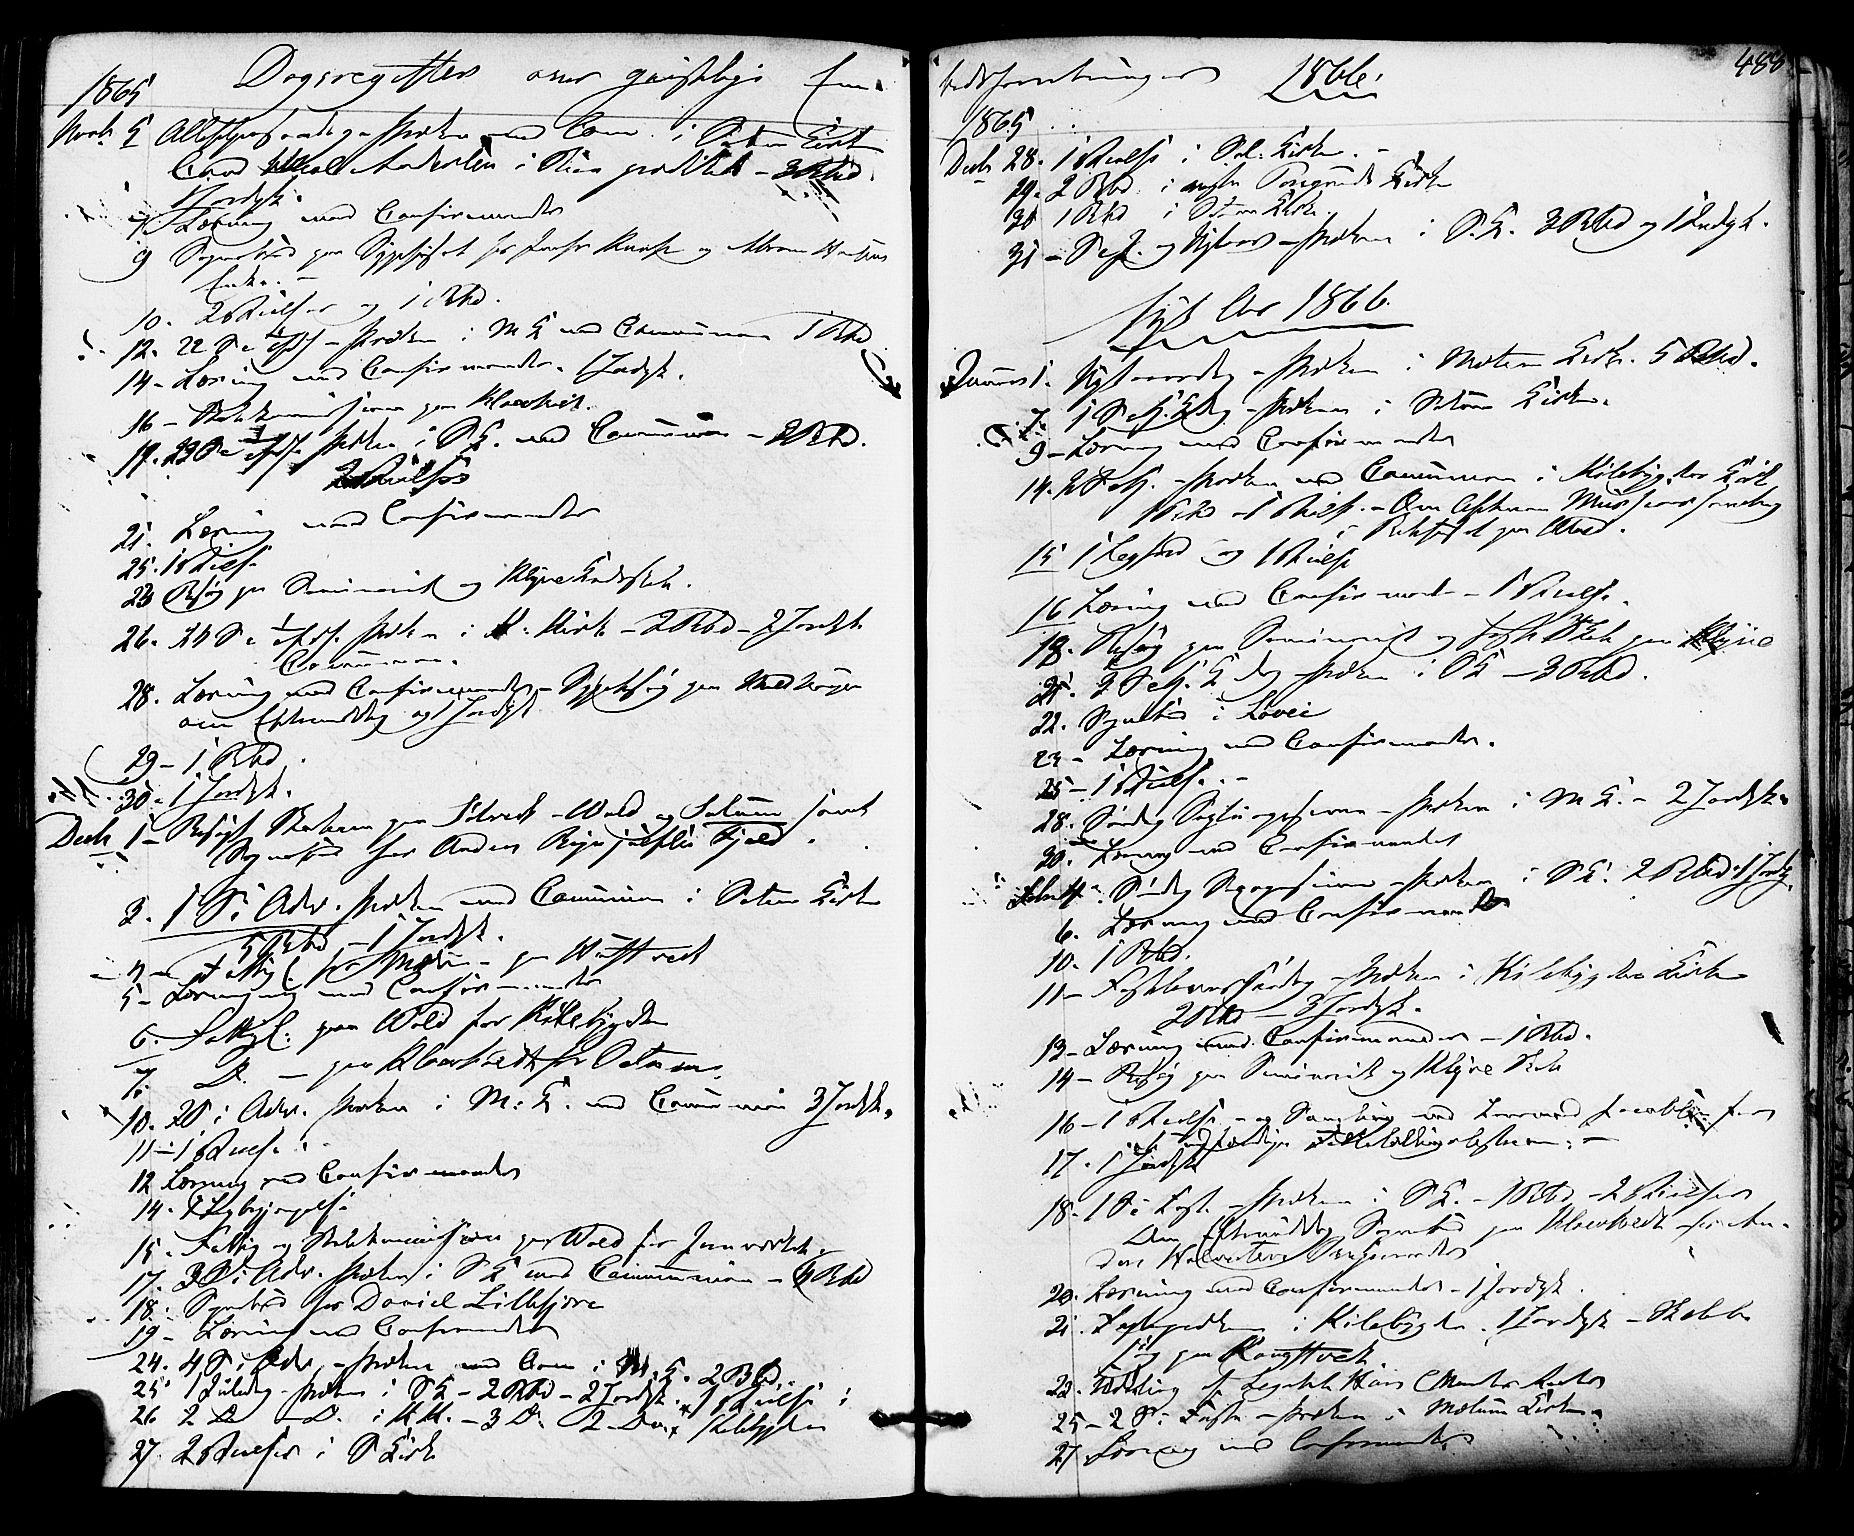 SAKO, Solum kirkebøker, F/Fa/L0008: Ministerialbok nr. I 8, 1865-1876, s. 488